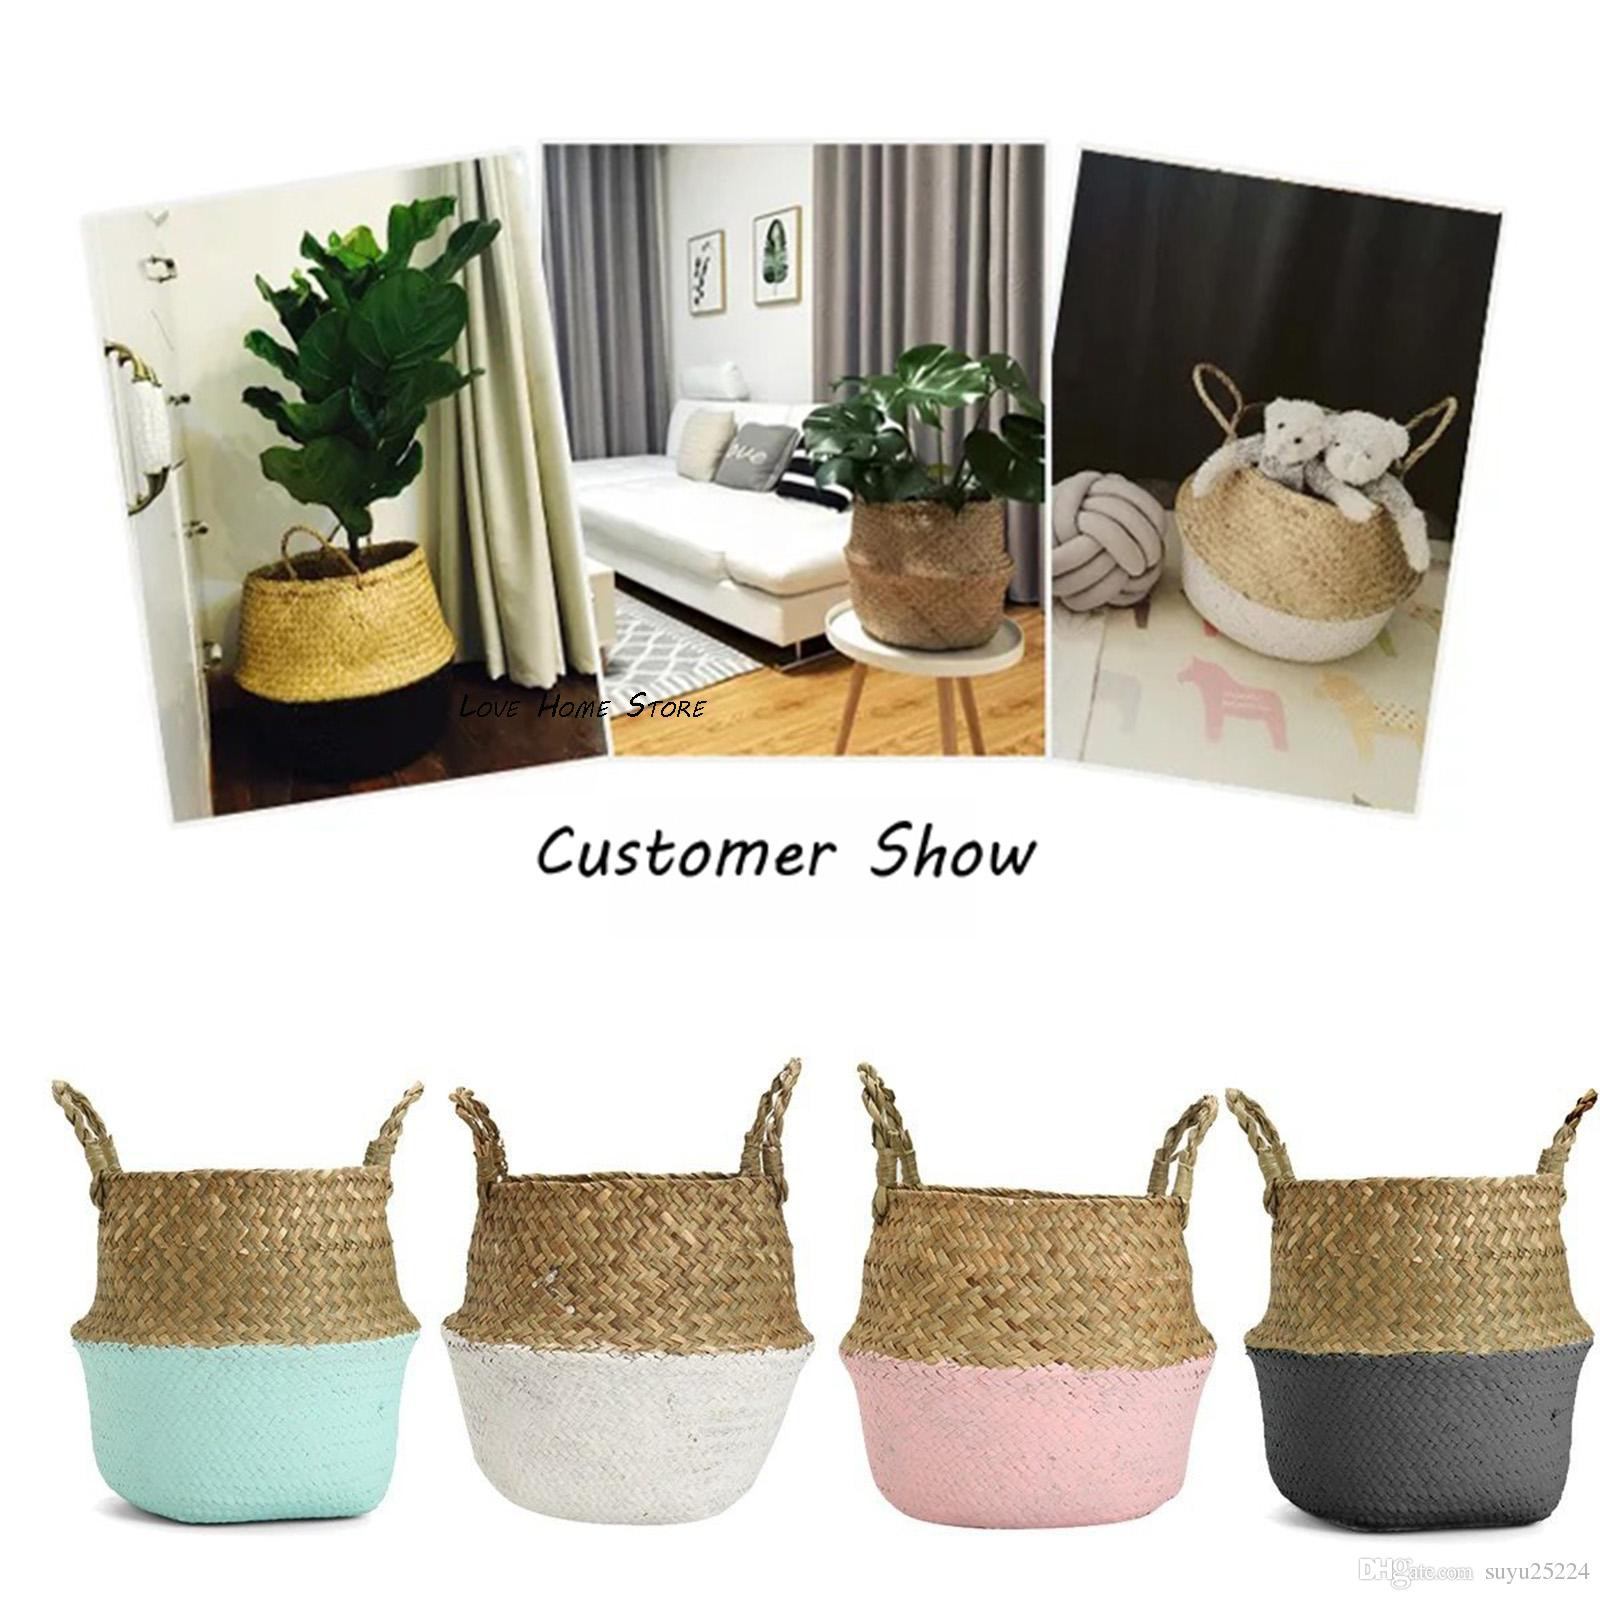 Discount Natural Rattan Flower Basket Planter Basket Organize Black Foldable Seagrass Basket Laundry R Home Garden Decor Nursery Pots 38cm Big From China